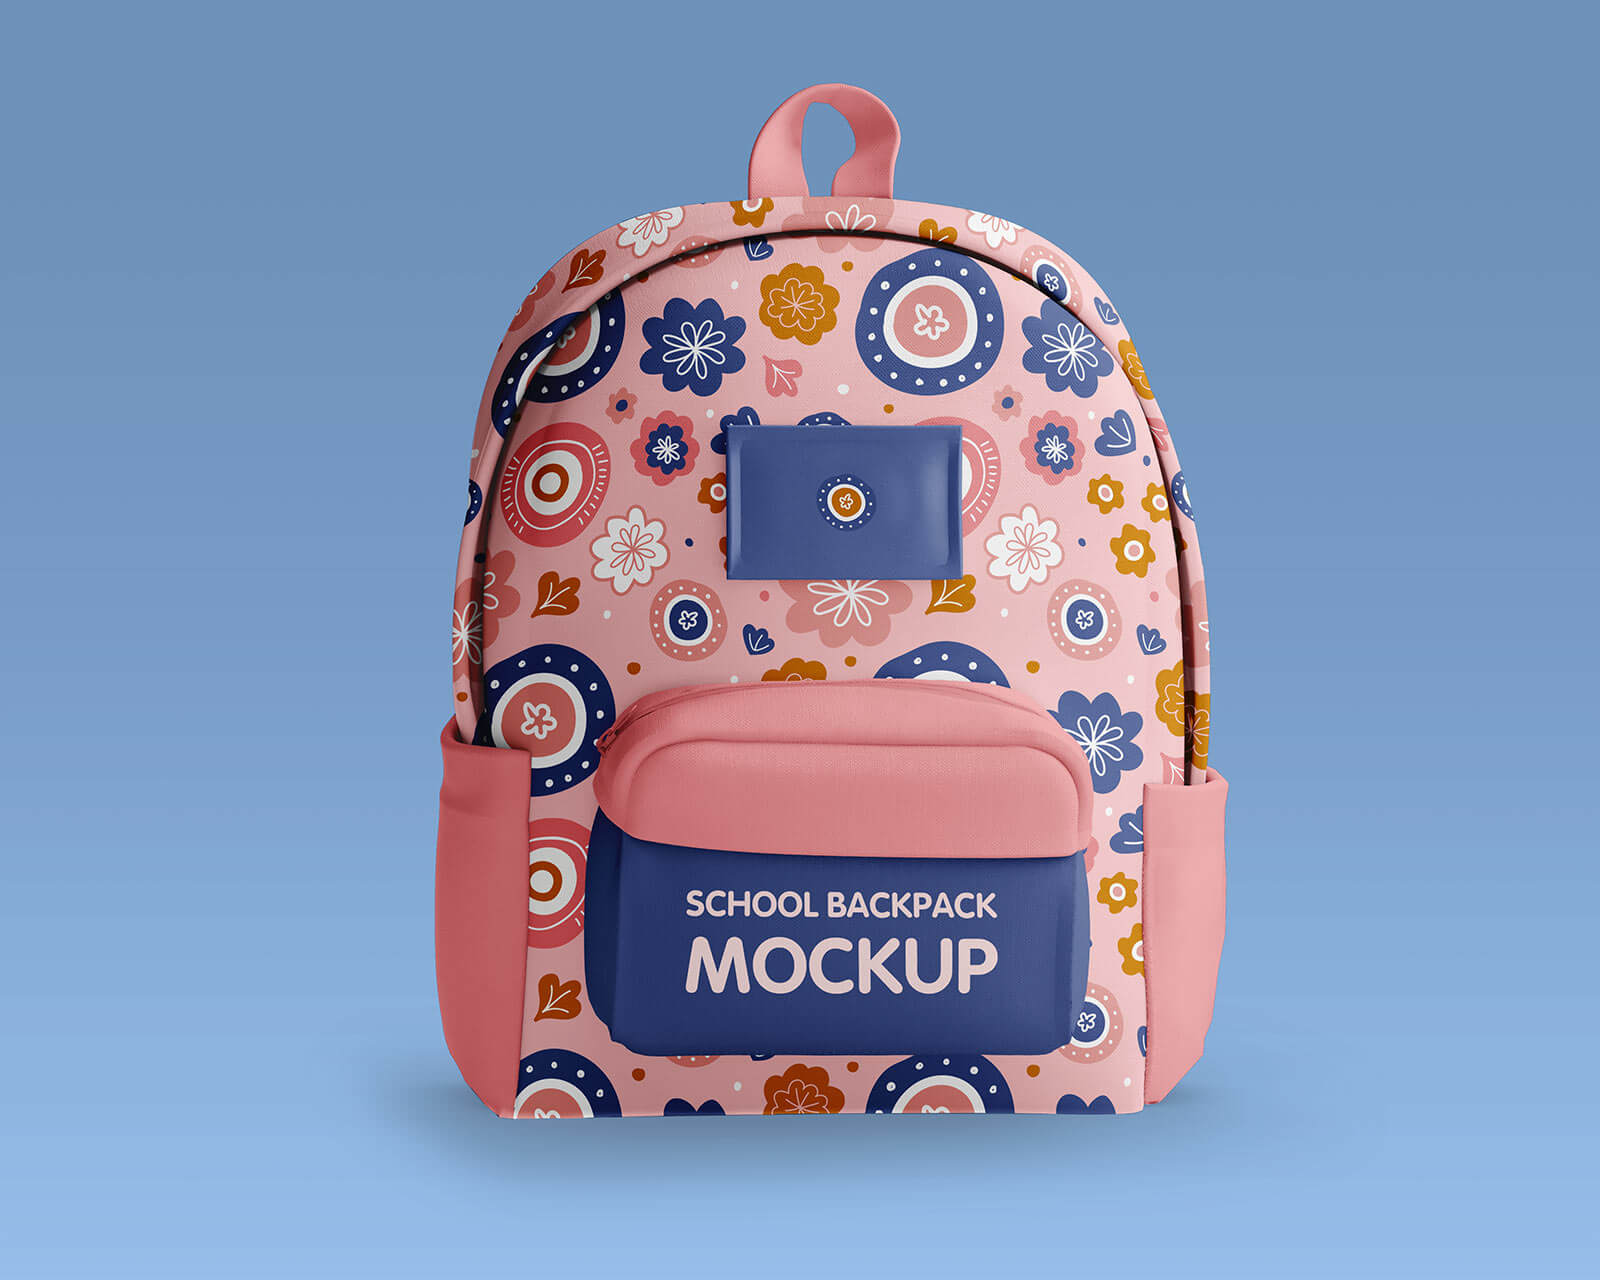 Free Kid's School Backpack Mockup PSD Set